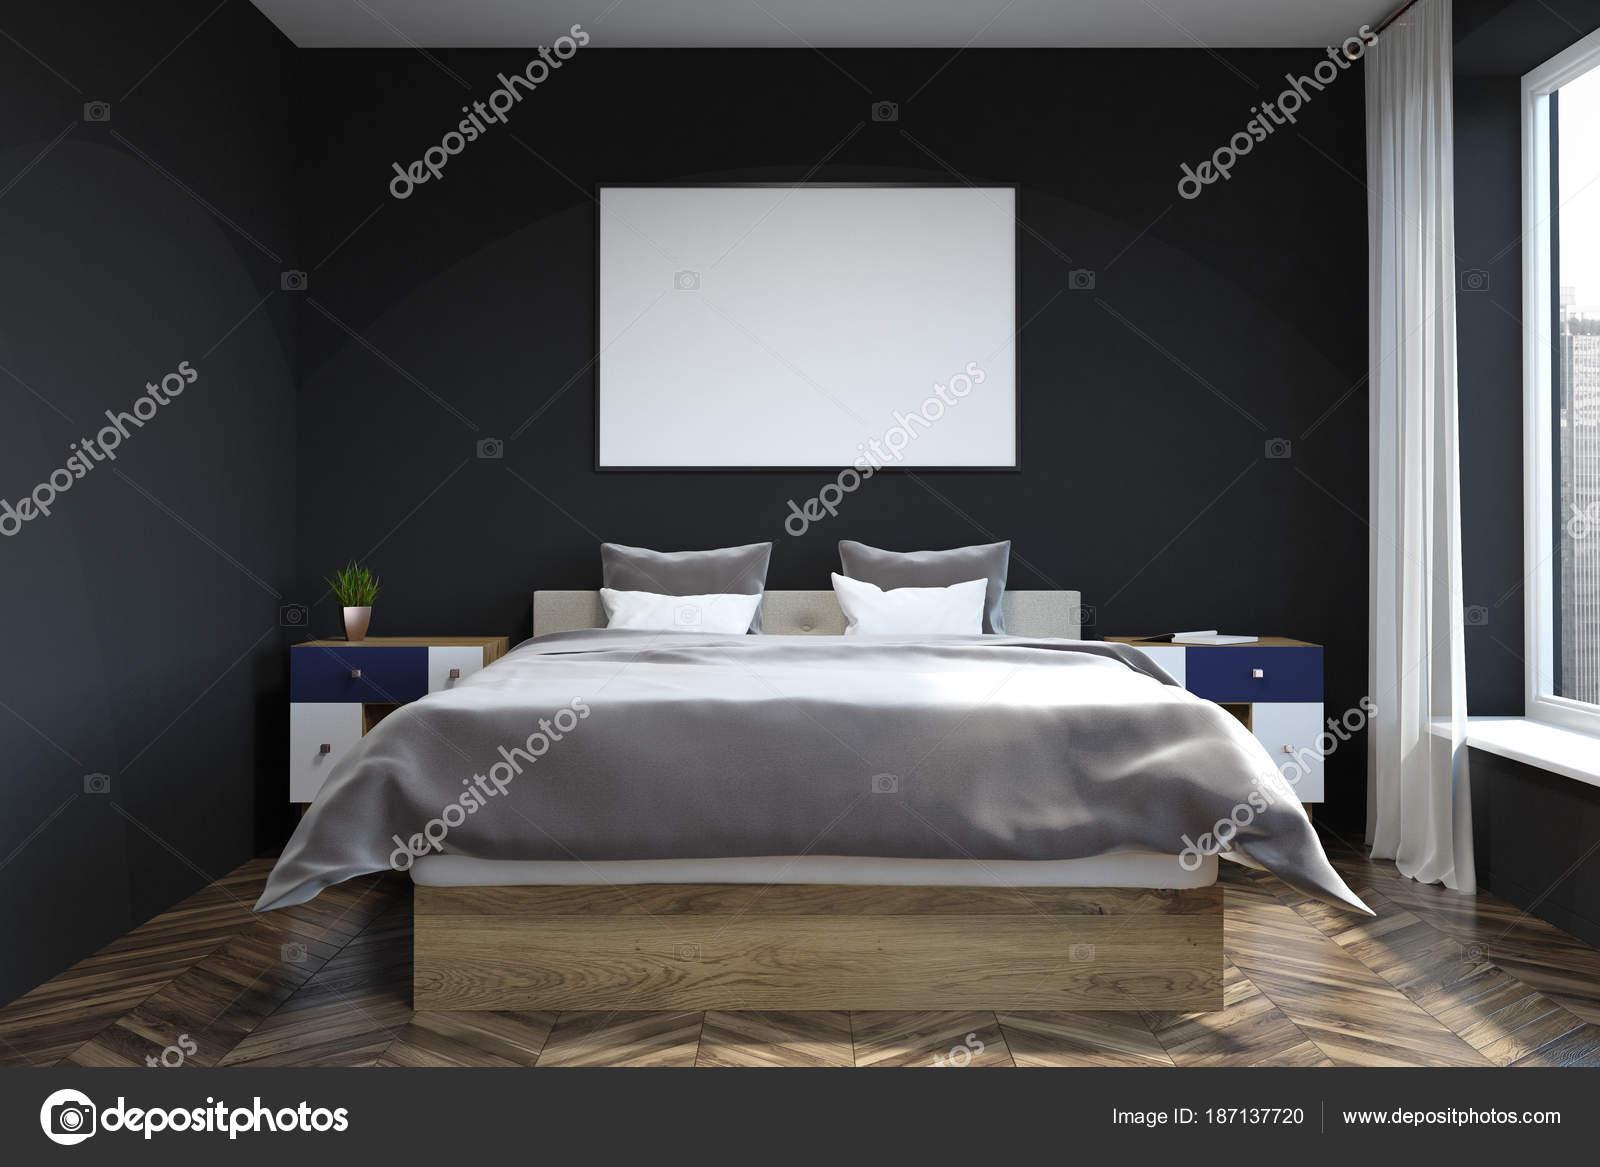 Zwarte Slaapkamer Muur : Zwarte muur slaapkamer interieur poster u stockfoto